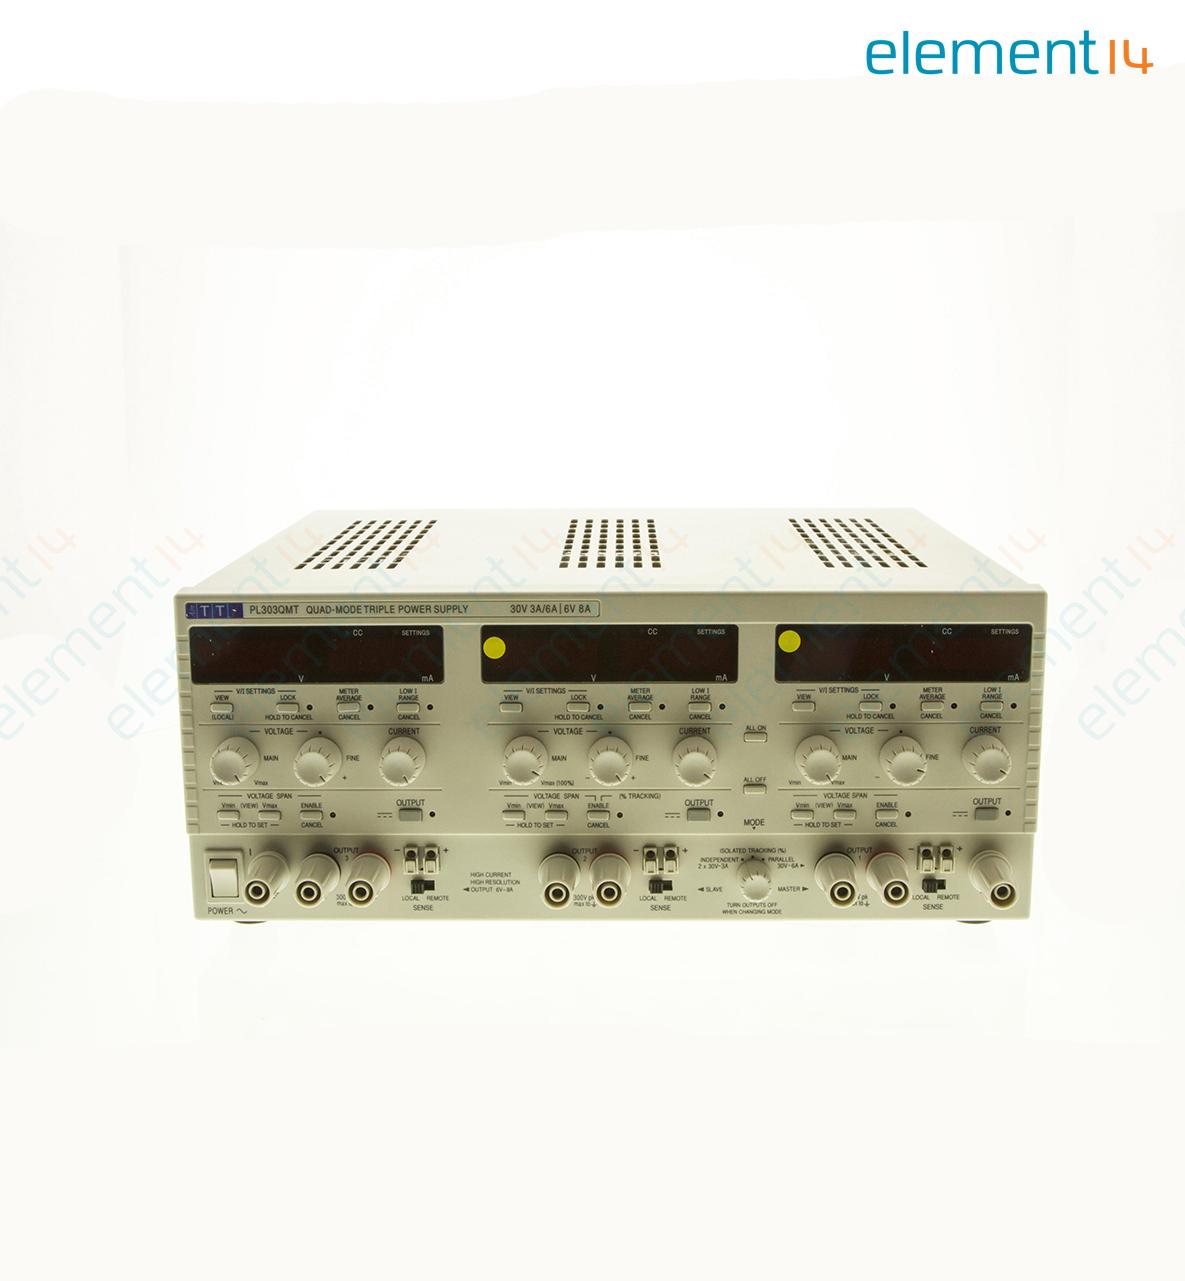 Pl303qmt Aim Tti Instruments Bench Power Supply Linear Regulated Diagram Ingram 3 30v 3a Adjustable Dc